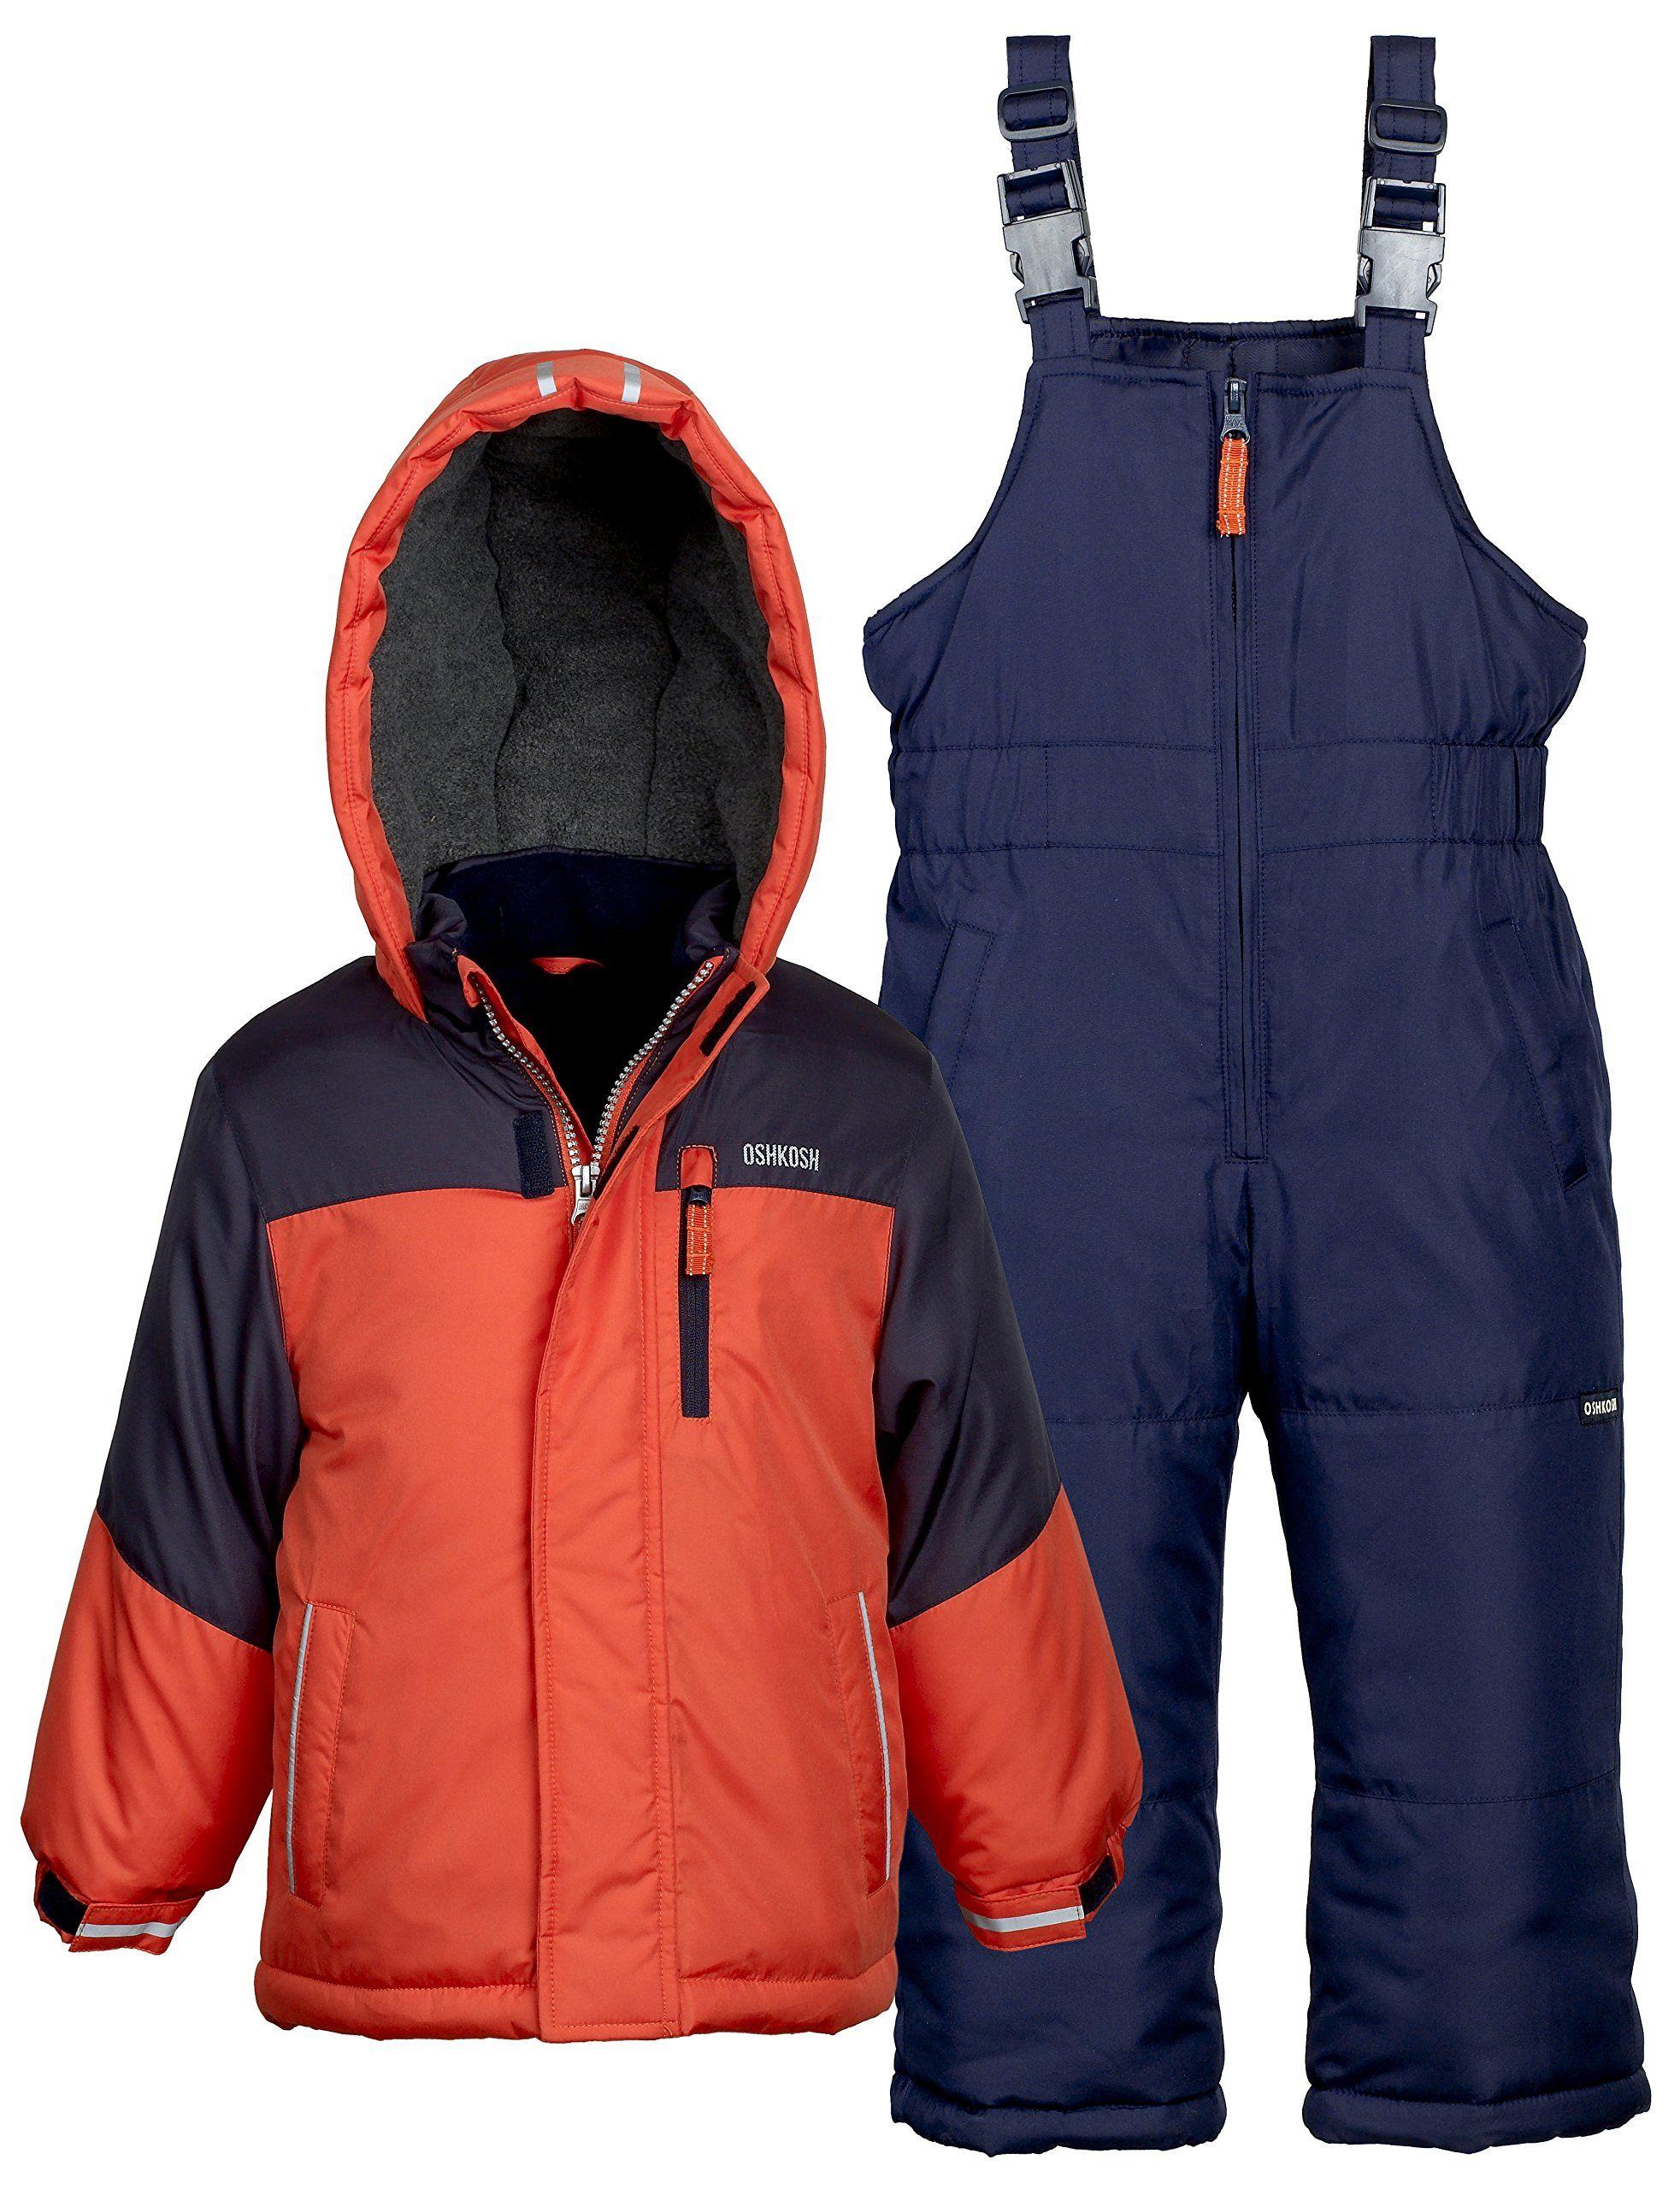 9defc9bce8bb Osh Kosh Boys Kids Winter Snowboard Skiing Parka Jacket   Snow Bib ...